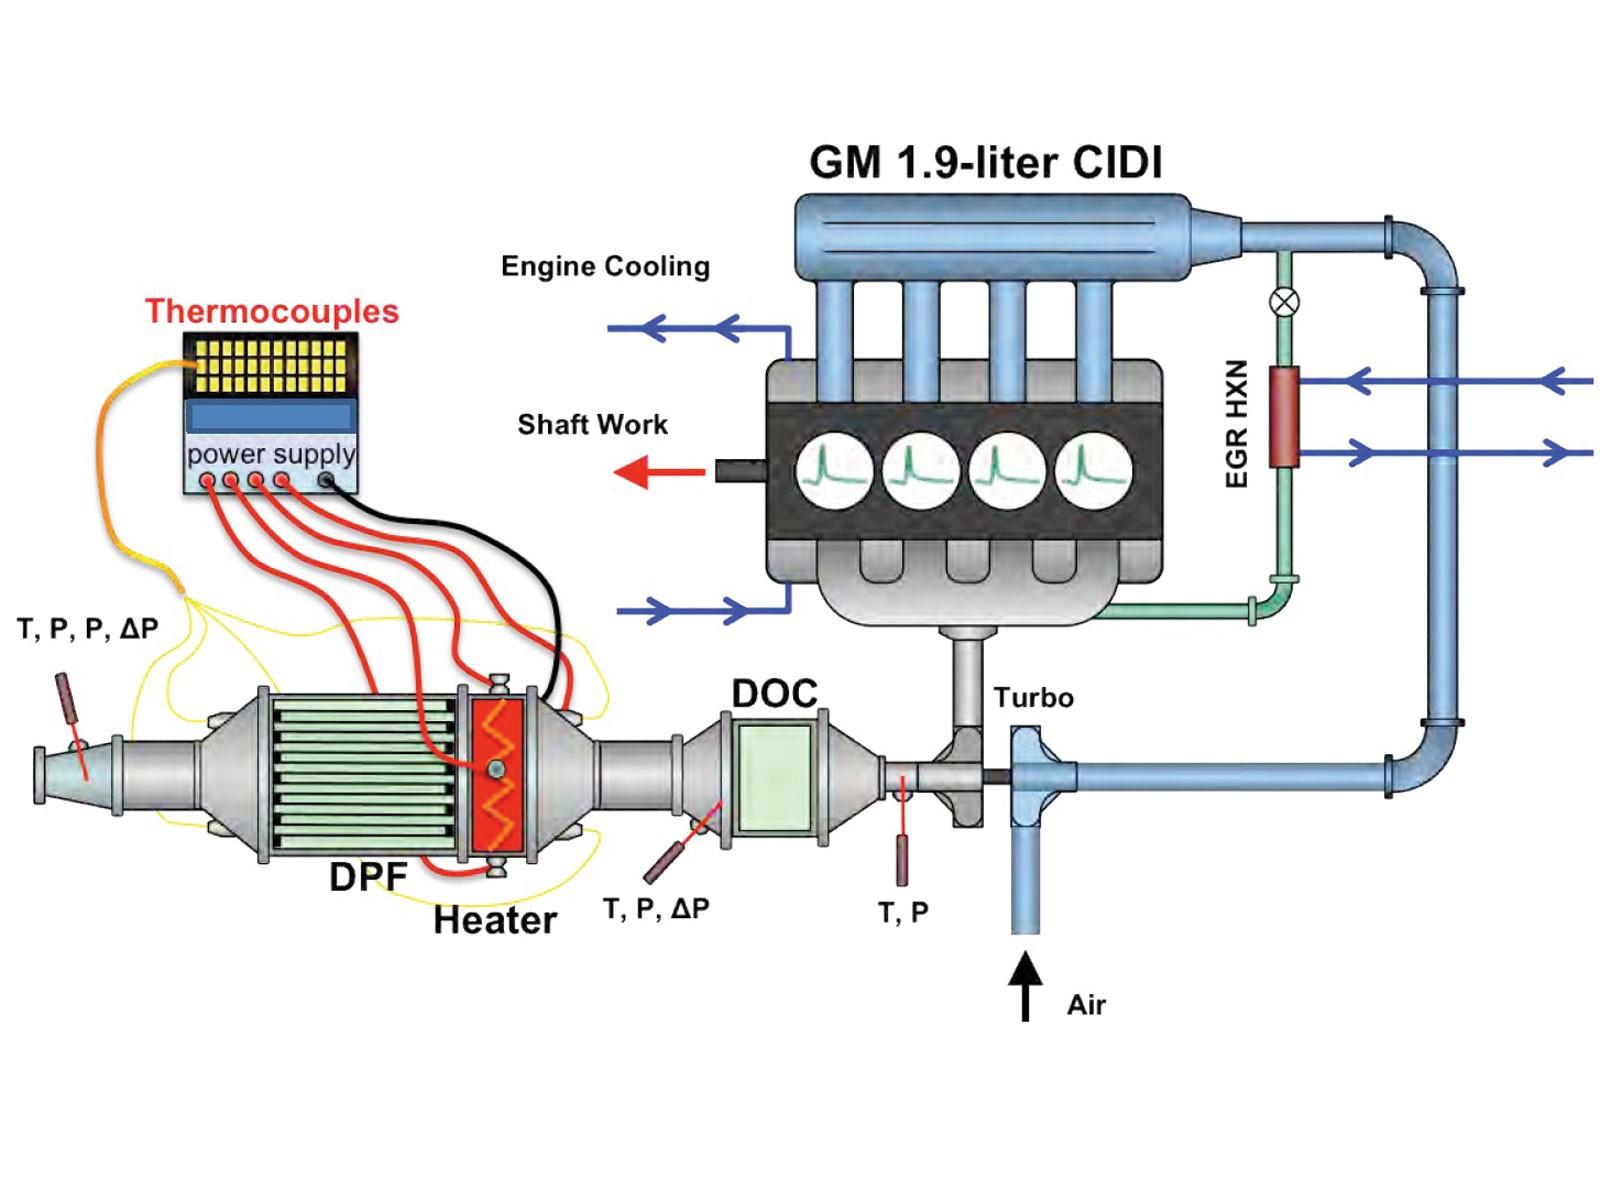 4 Stroke Engine Diagram Parts 4 Cylinder Engine Schematics Another Blog About Wiring Diagram • Of 4 Stroke Engine Diagram Parts